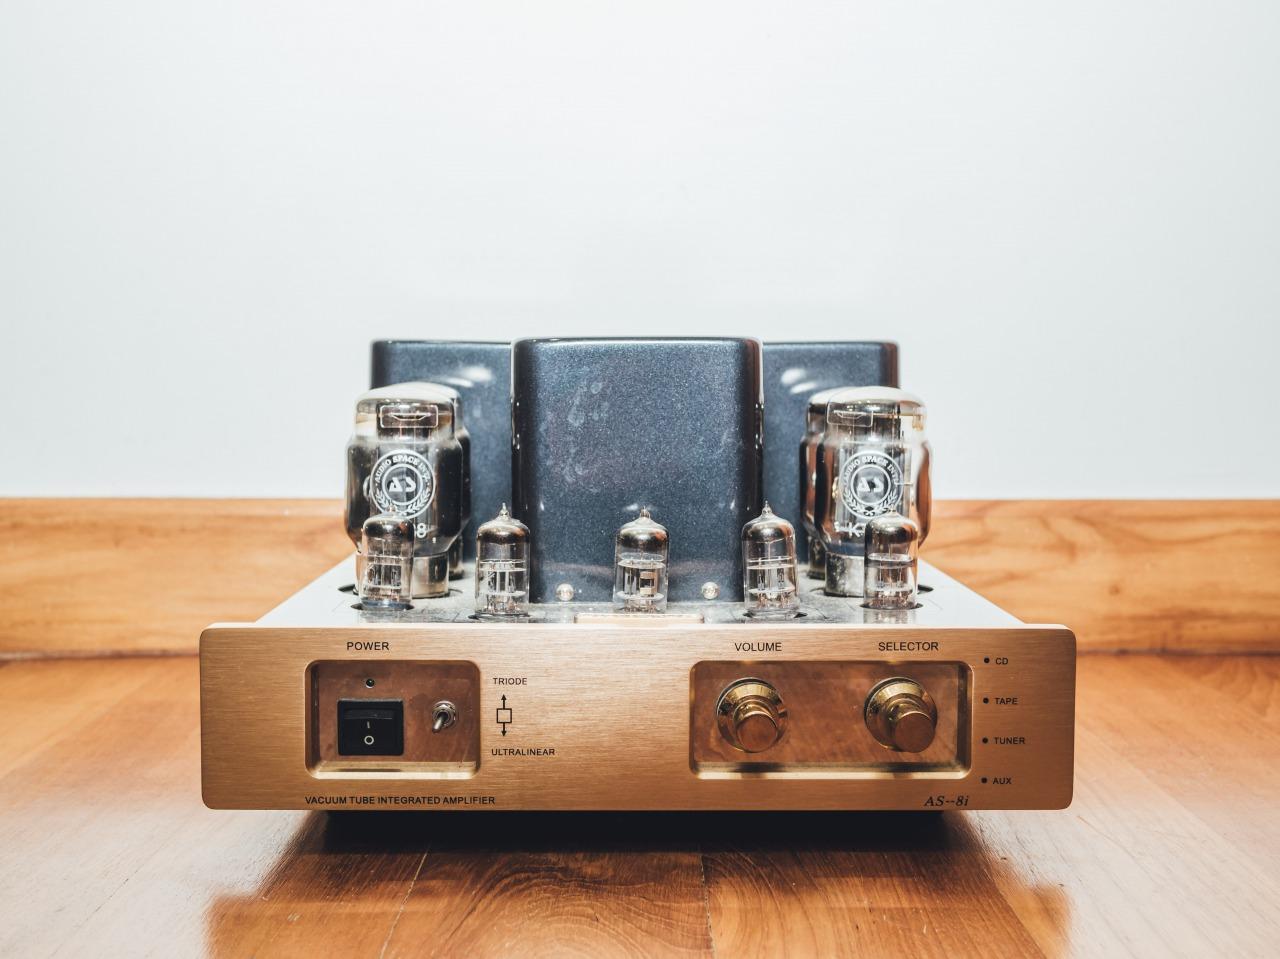 amp - 10万円でオーディオ始めるならこれ!おすすめのスピーカーとアンプの組み合わせ